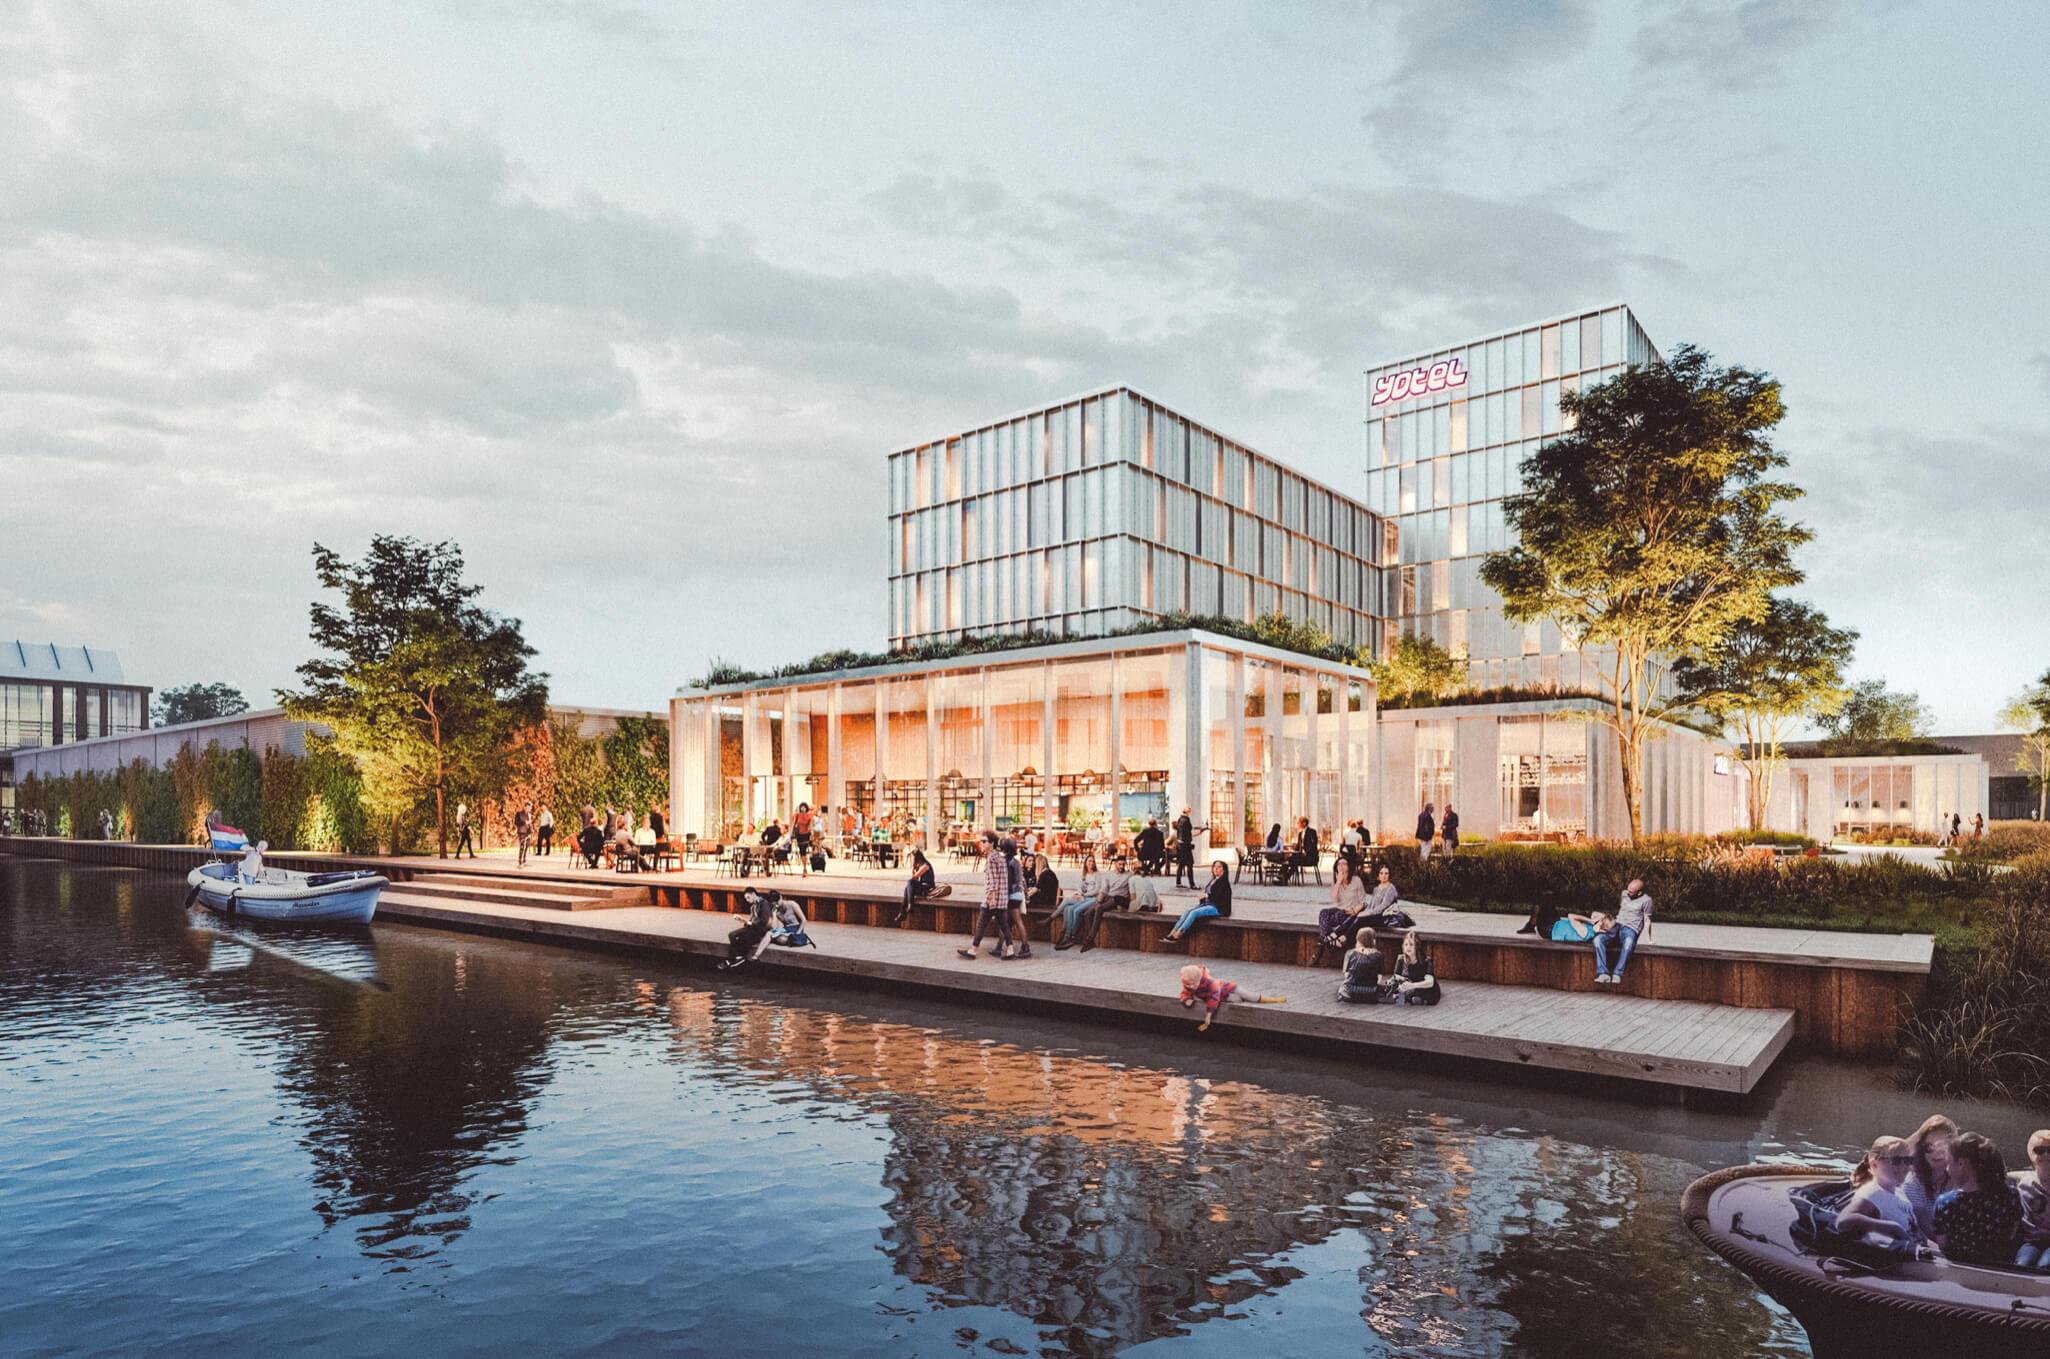 YOTEL AMSTERDAM: REVOLUTIONAIR, INNOVATIEF EN DUURZAAM HOTEL GEOPENDIN NOORD